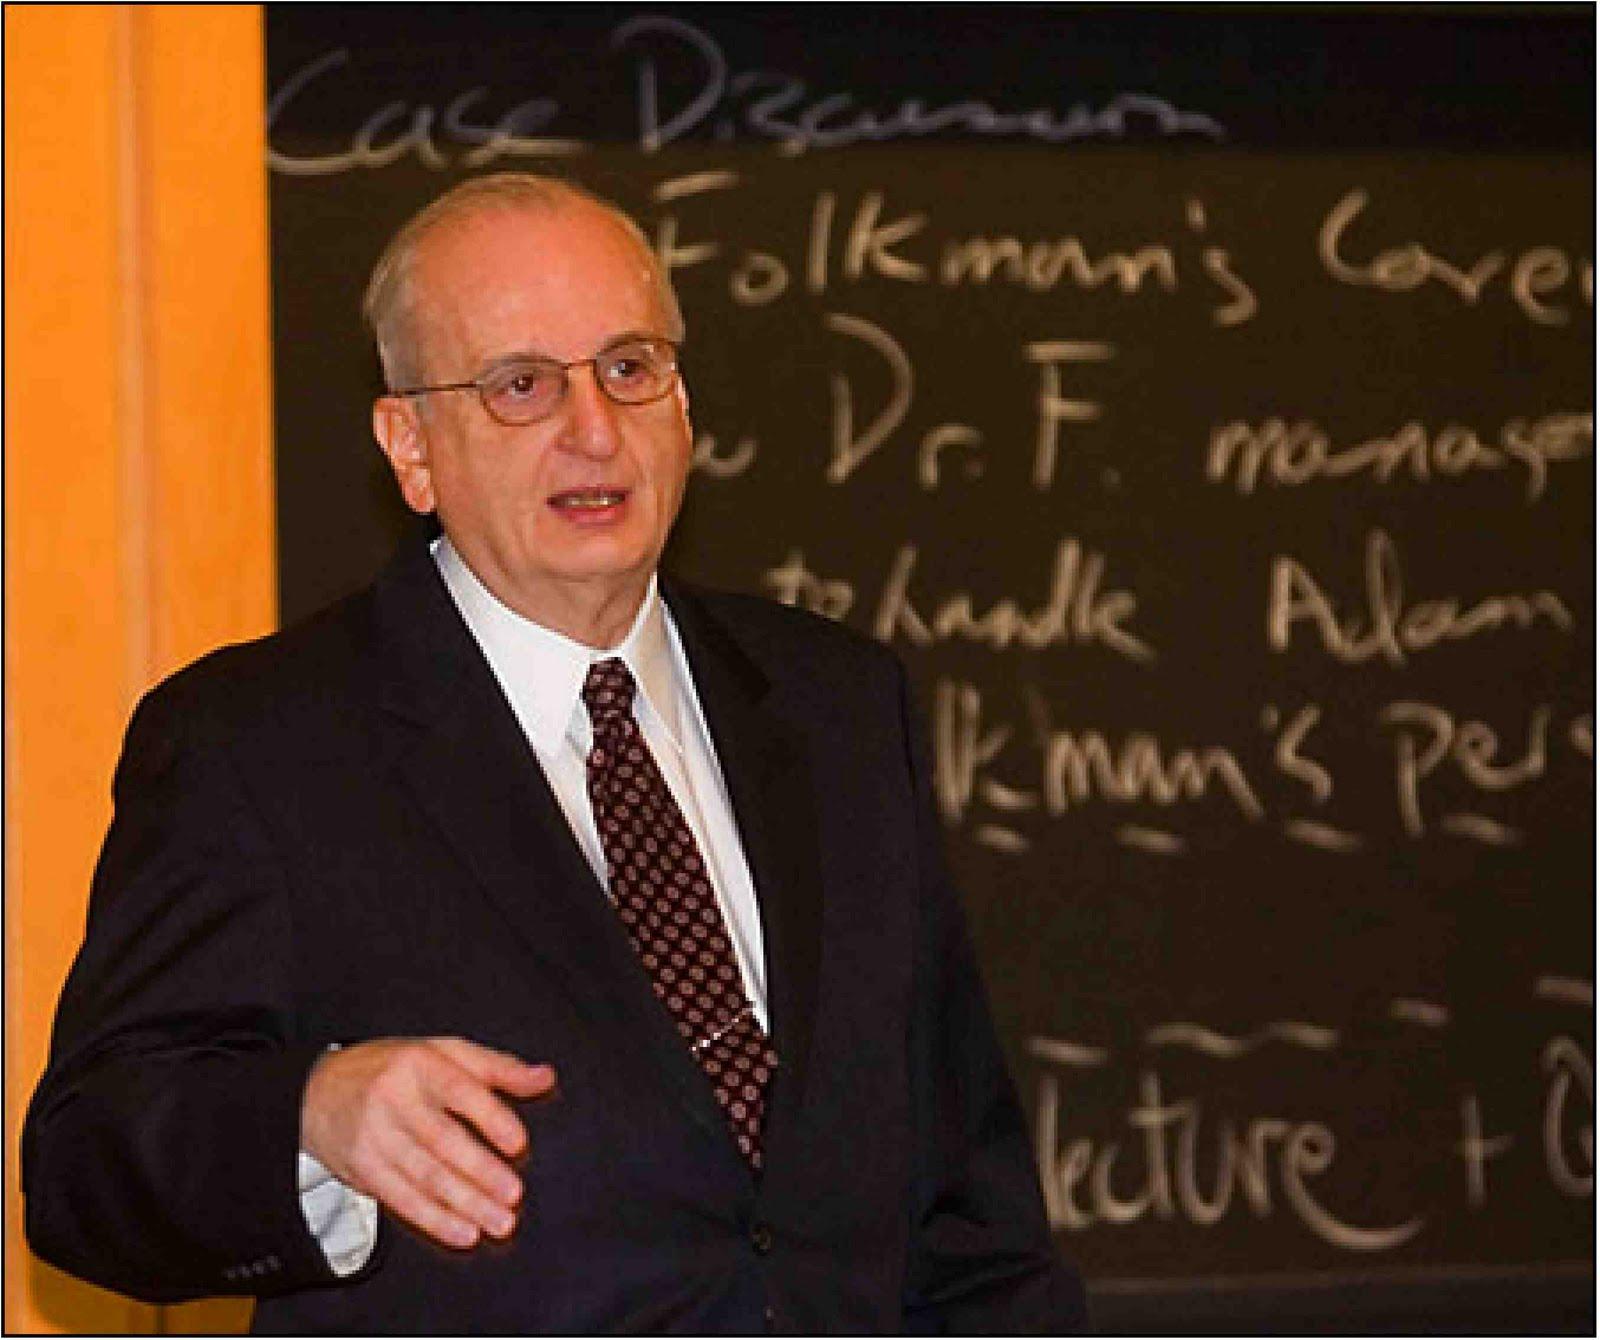 The Arts, Sciences and Medicine: AVASTIN and Judah Folkman's ...